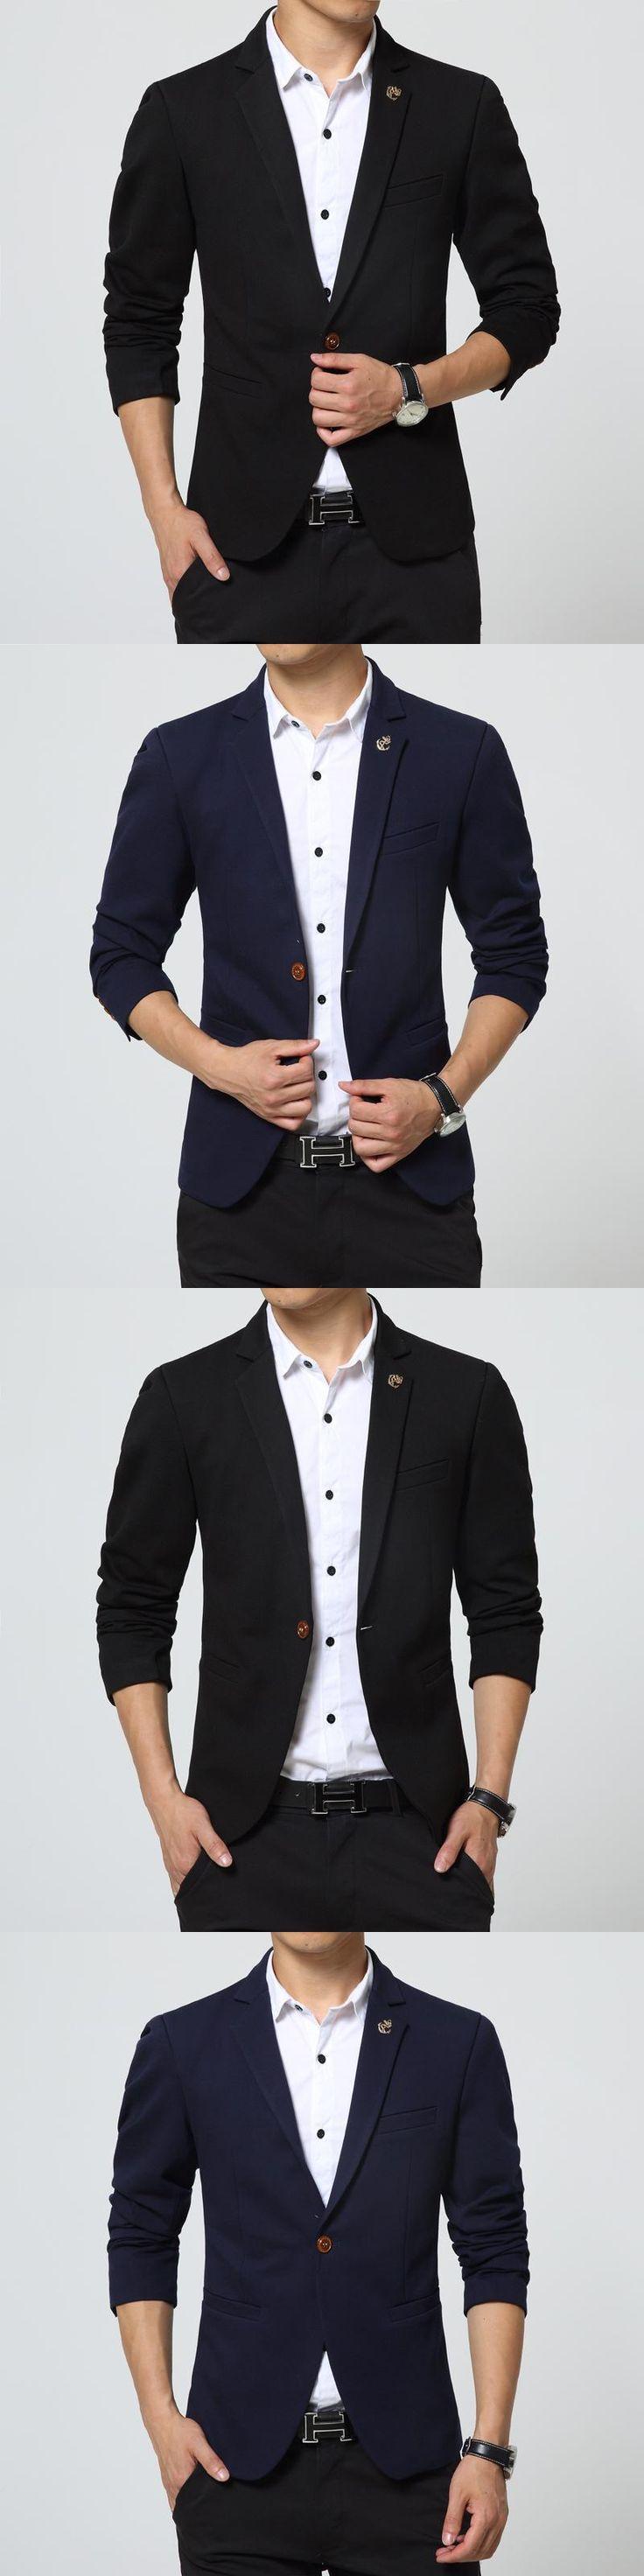 Mens Blazer Jacket black Slim Fit royal blue suit jacket casual coat long sleeve Ceket blazer masculine blazer hombre Male